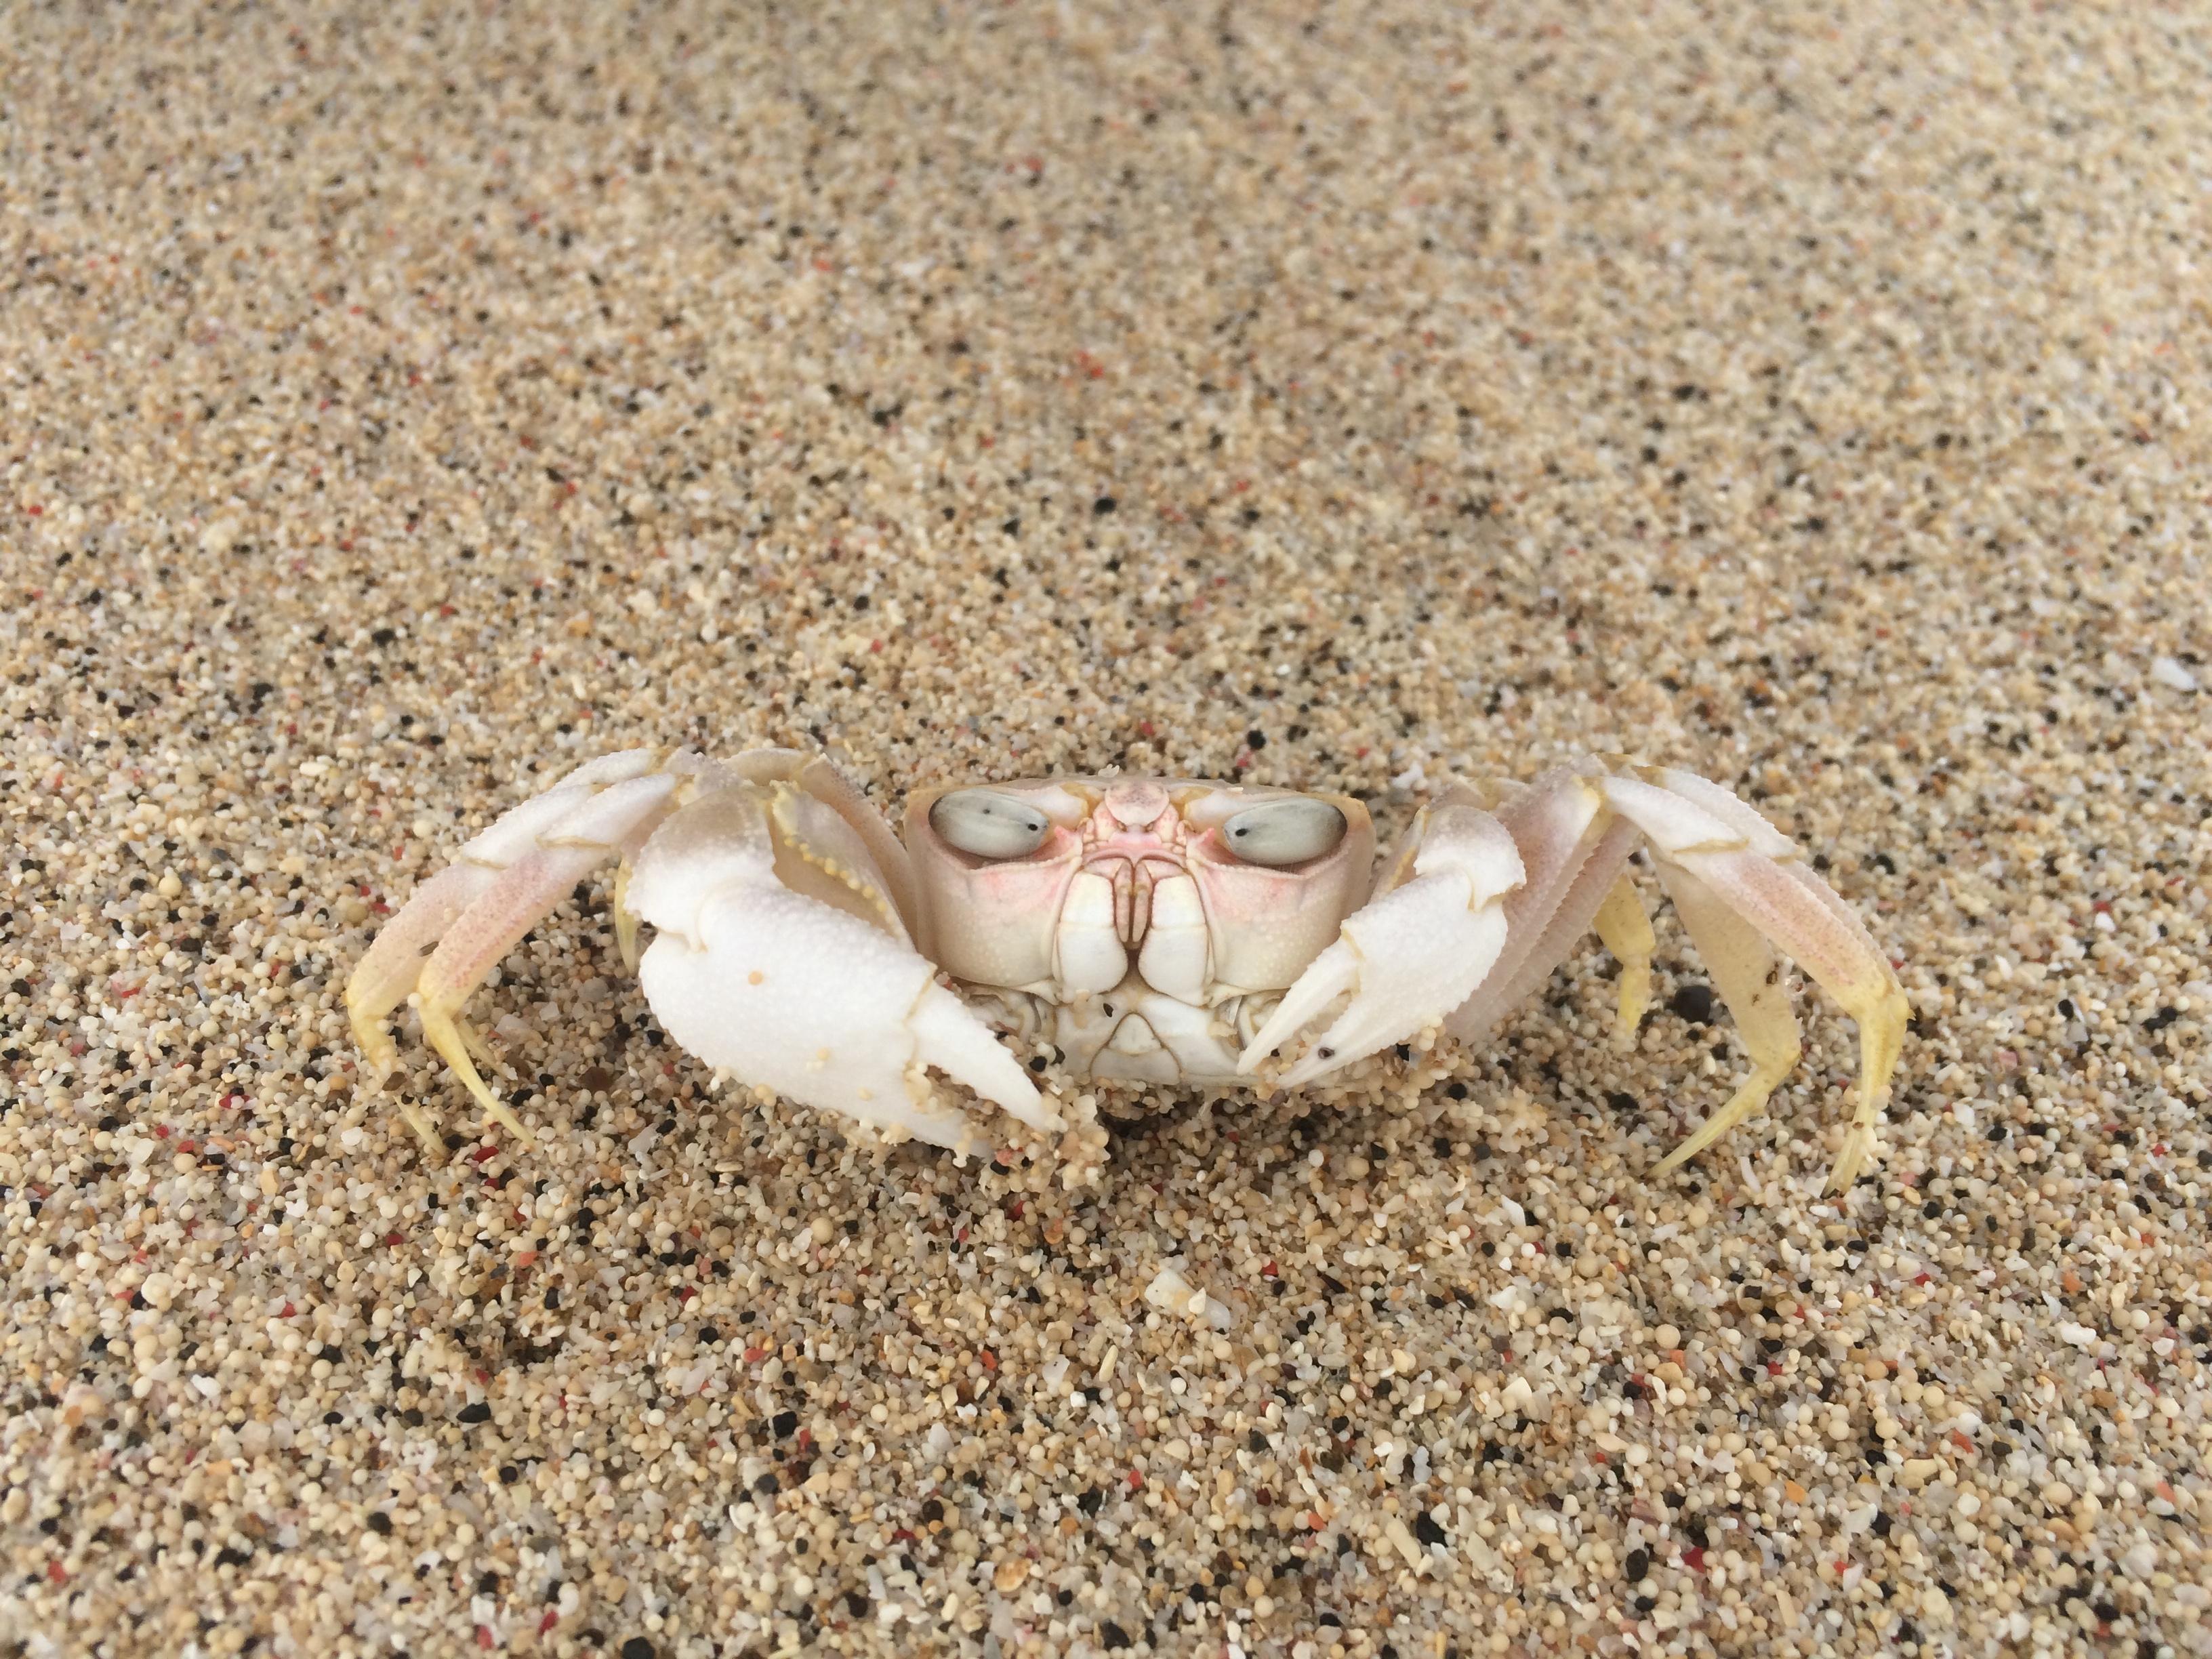 Crabe plage de sable blanc Mekaki, Lombok, Indonésie.